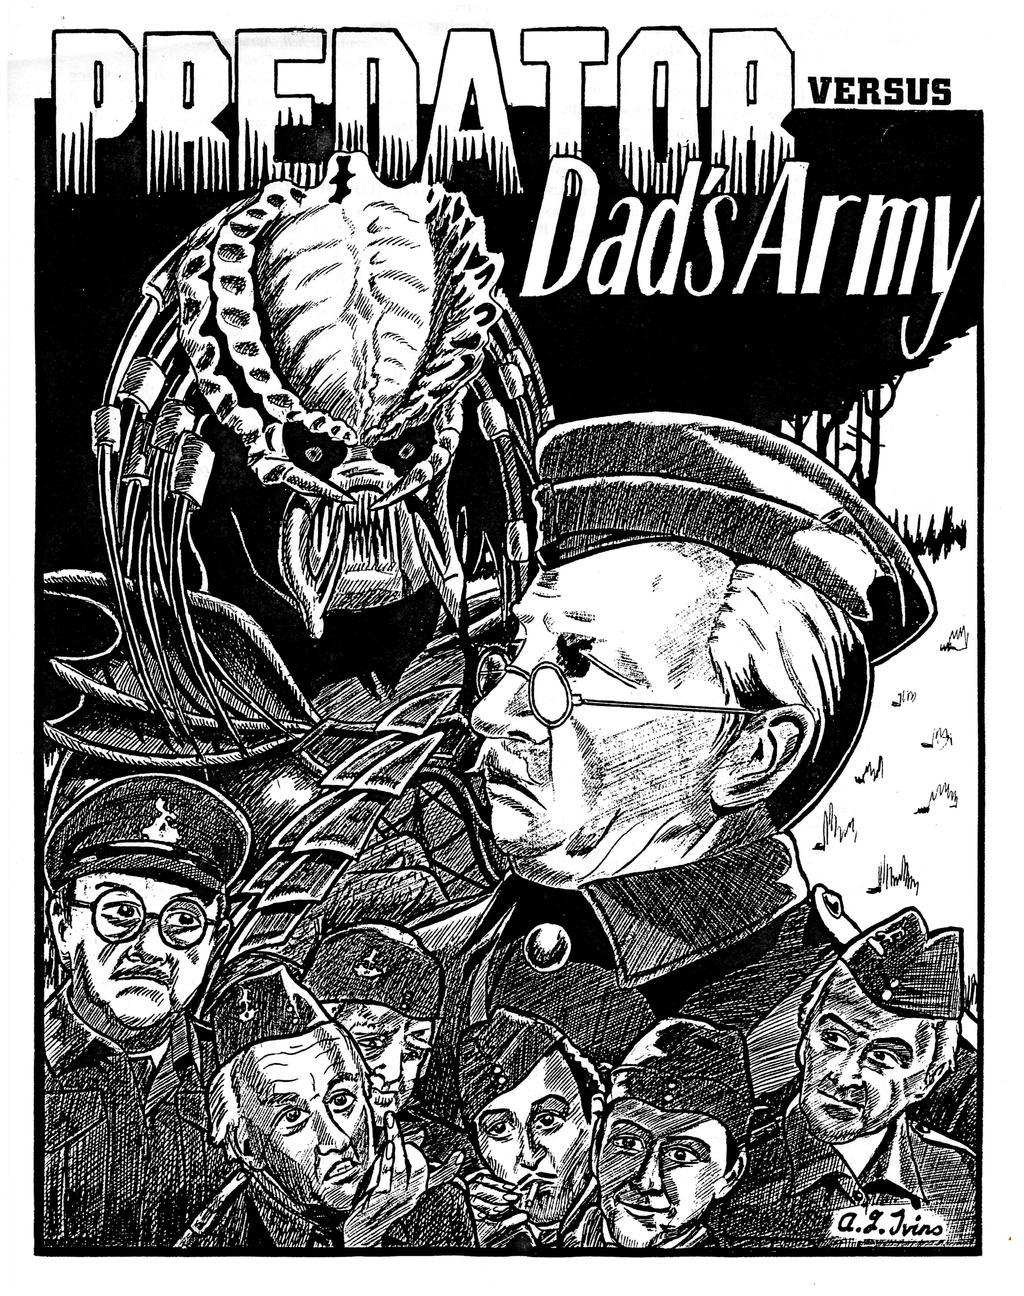 Predator Versus Dad's Army